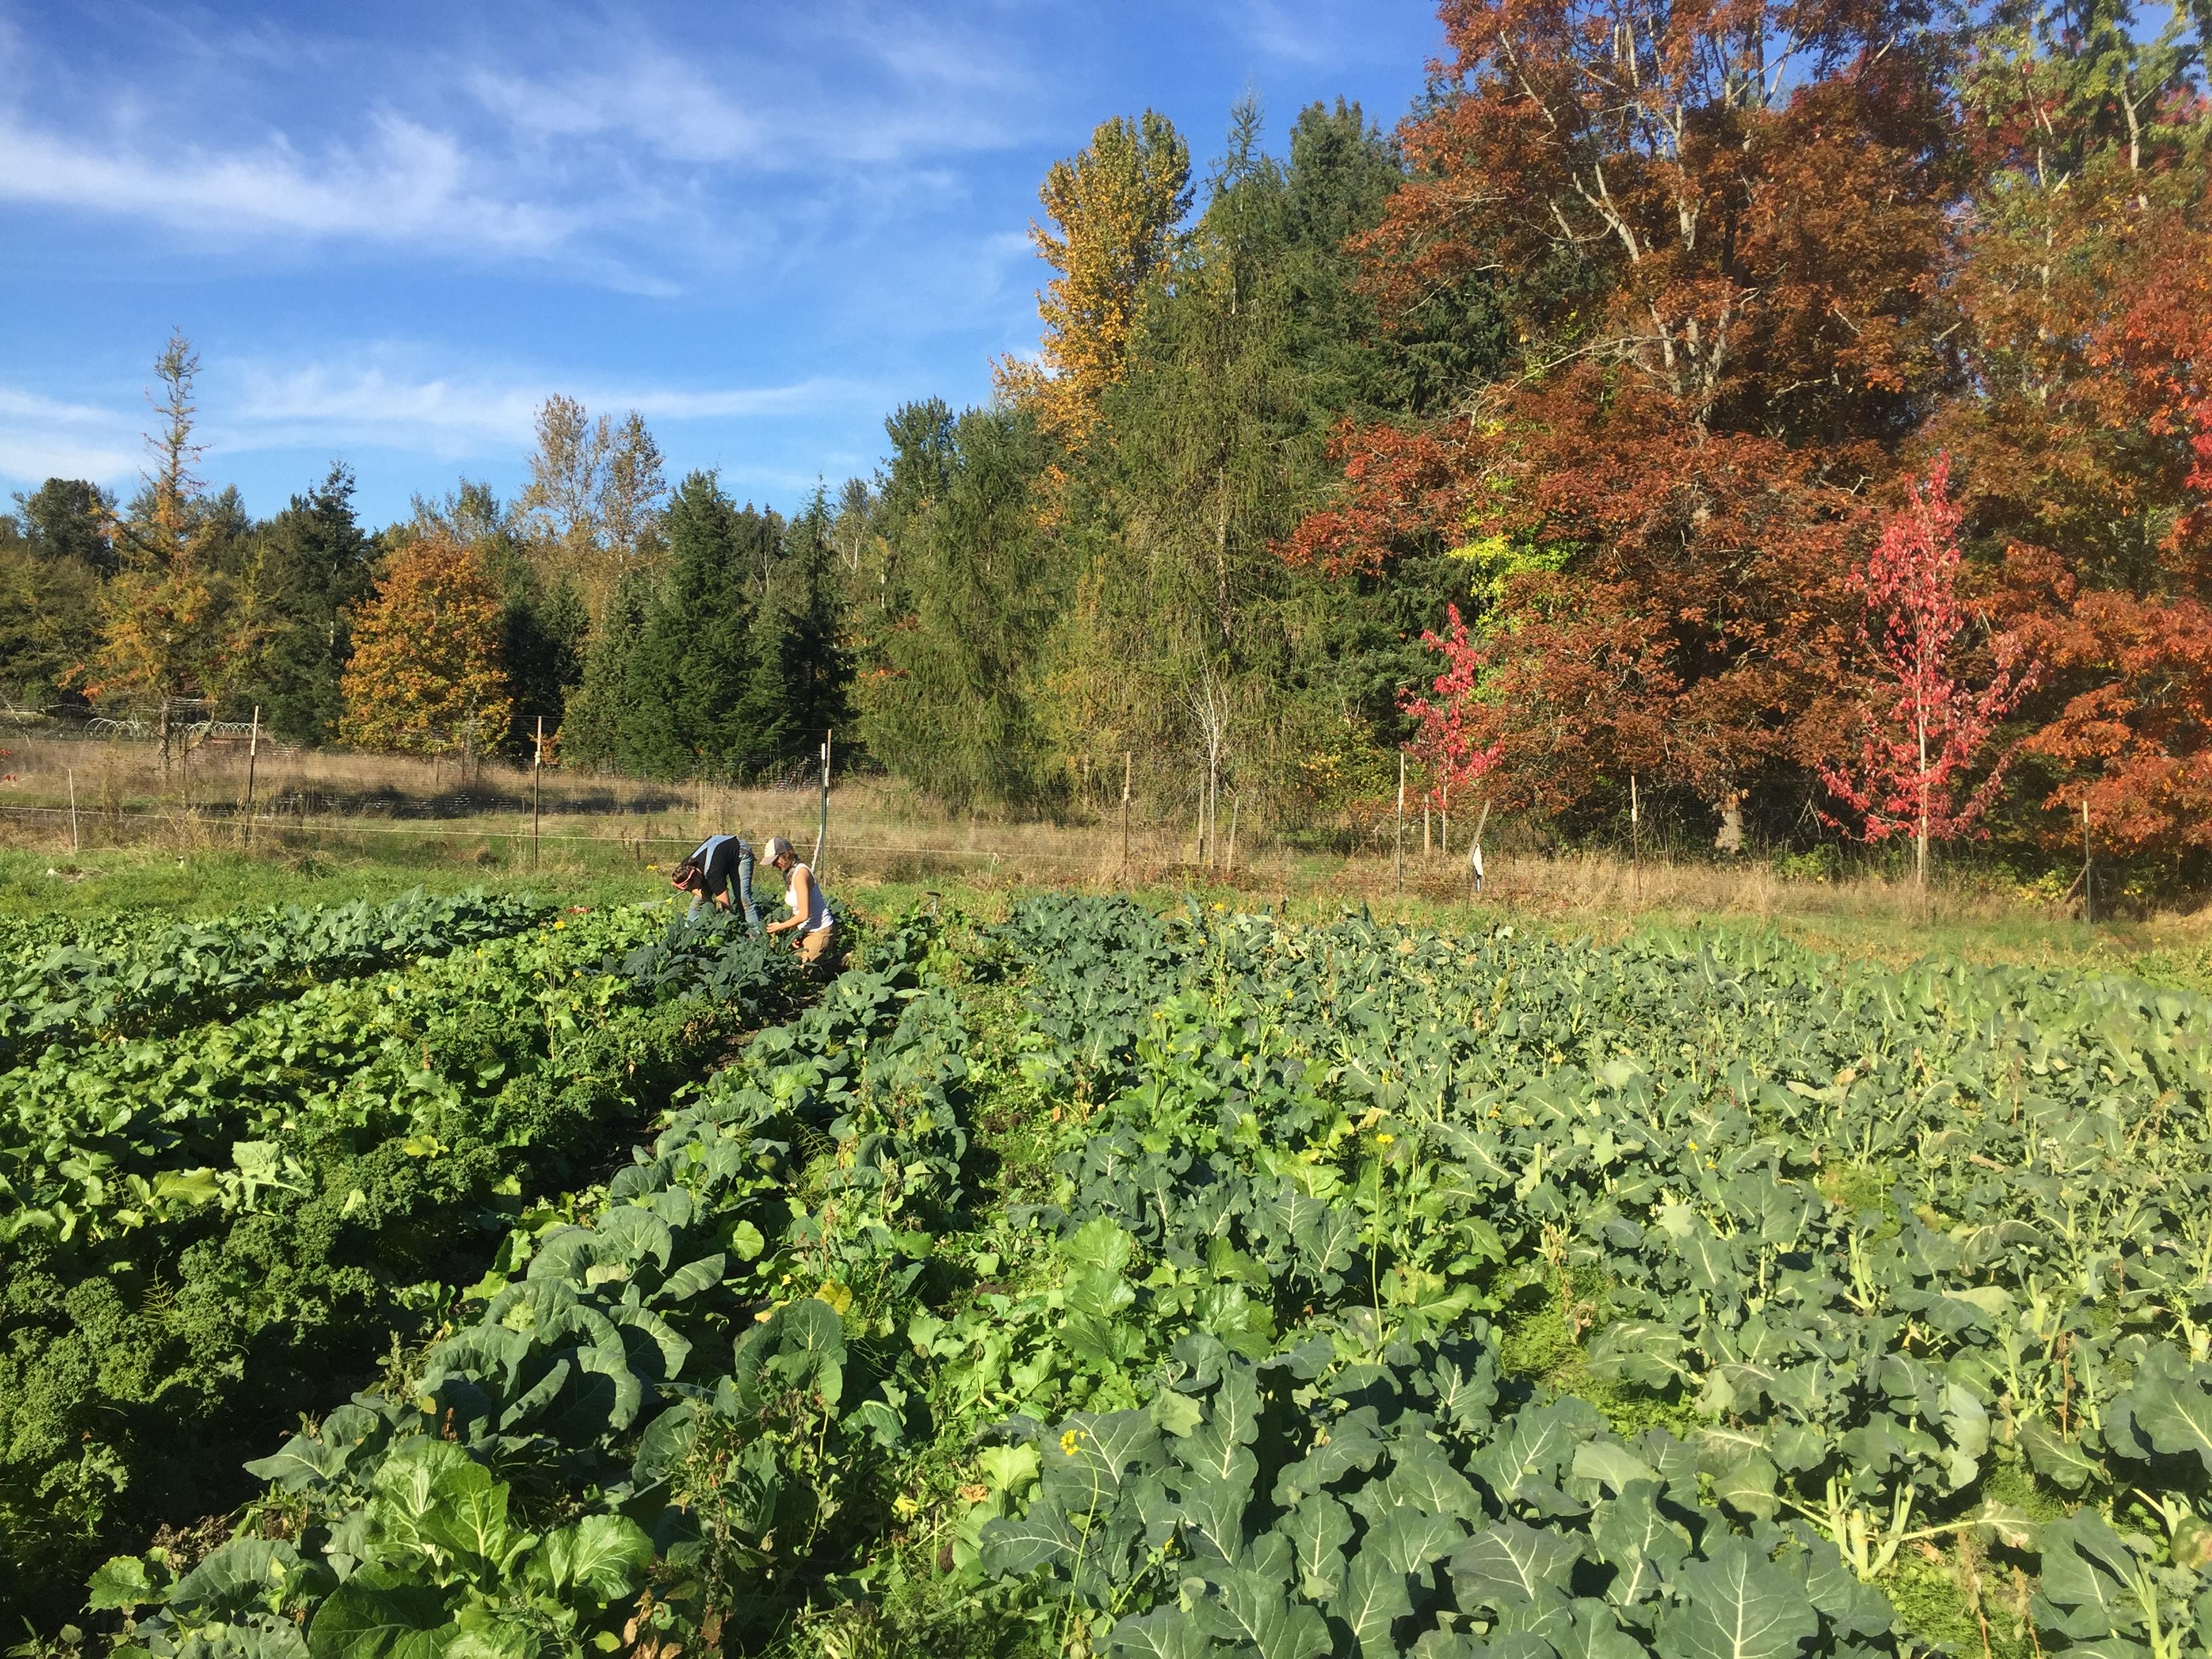 Farm Happenings for October 20, 2021